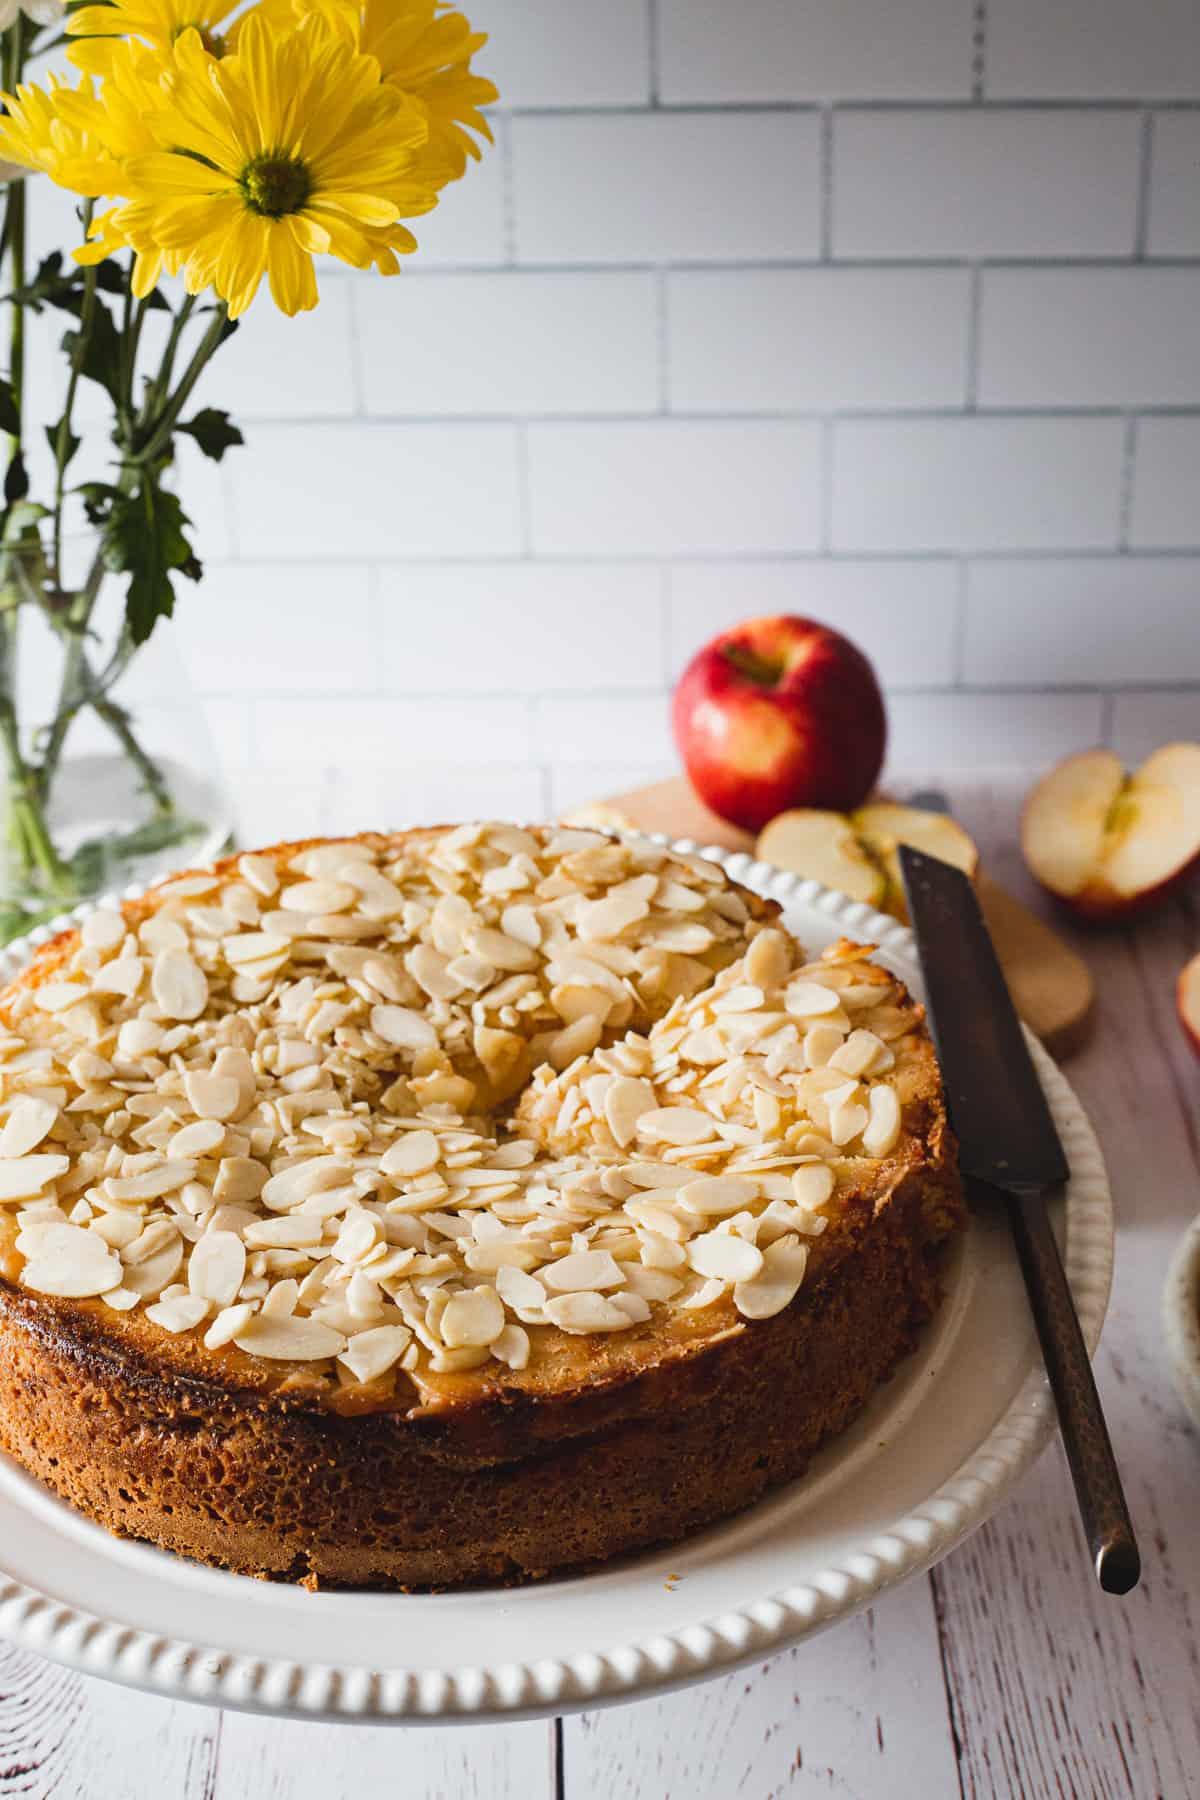 gluten free apple cake against yellow flowers backgdrop